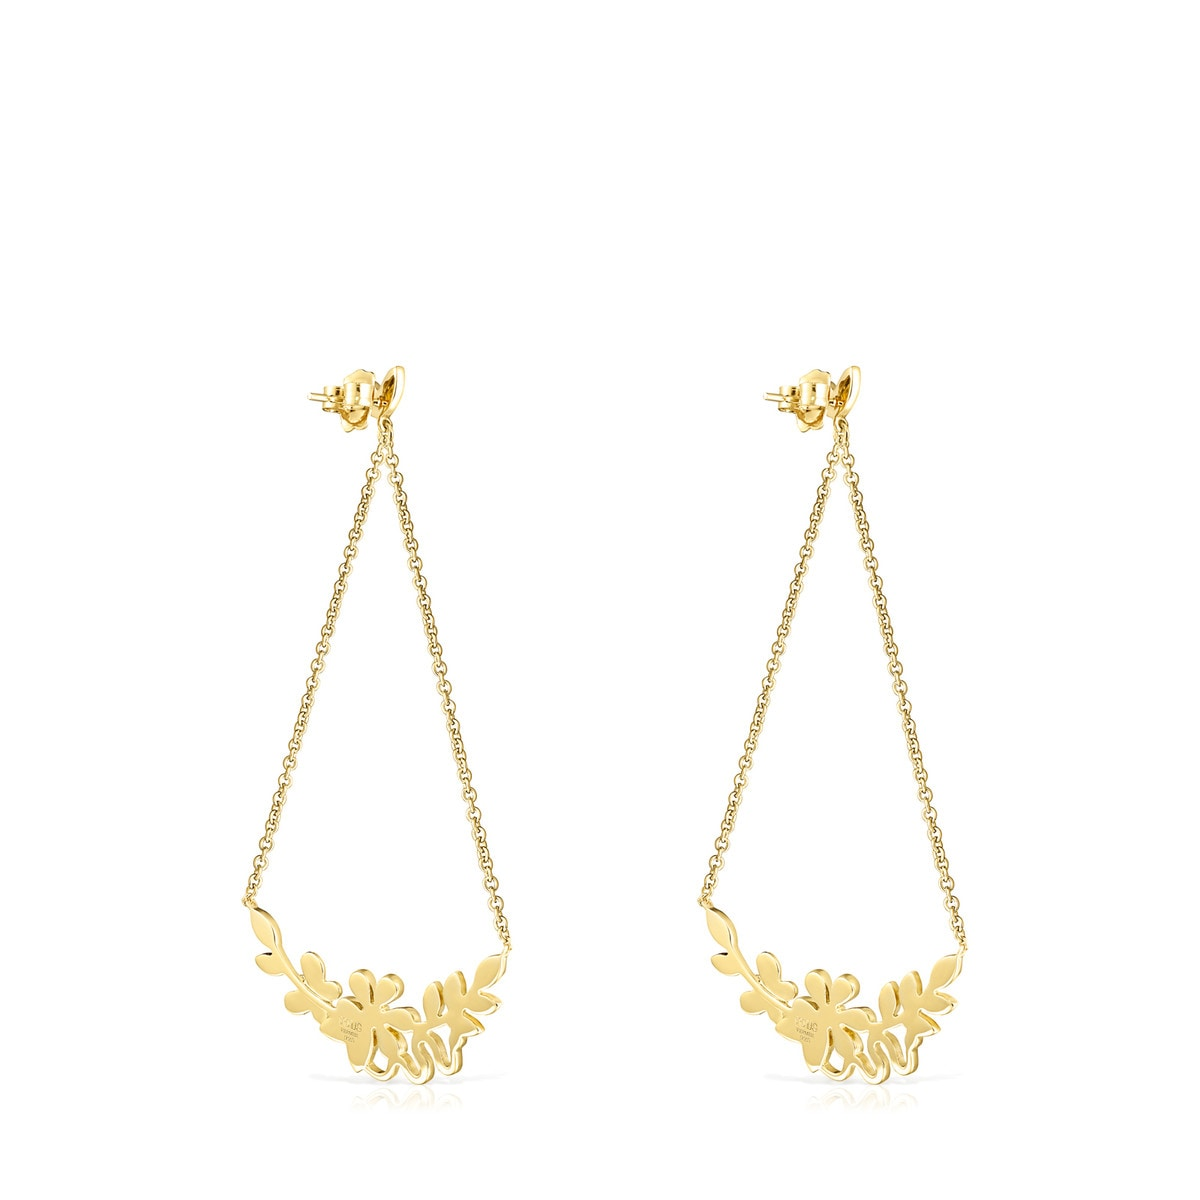 22b0009ce19af Long Gold Vermeil Real Mix Leaf Earrings